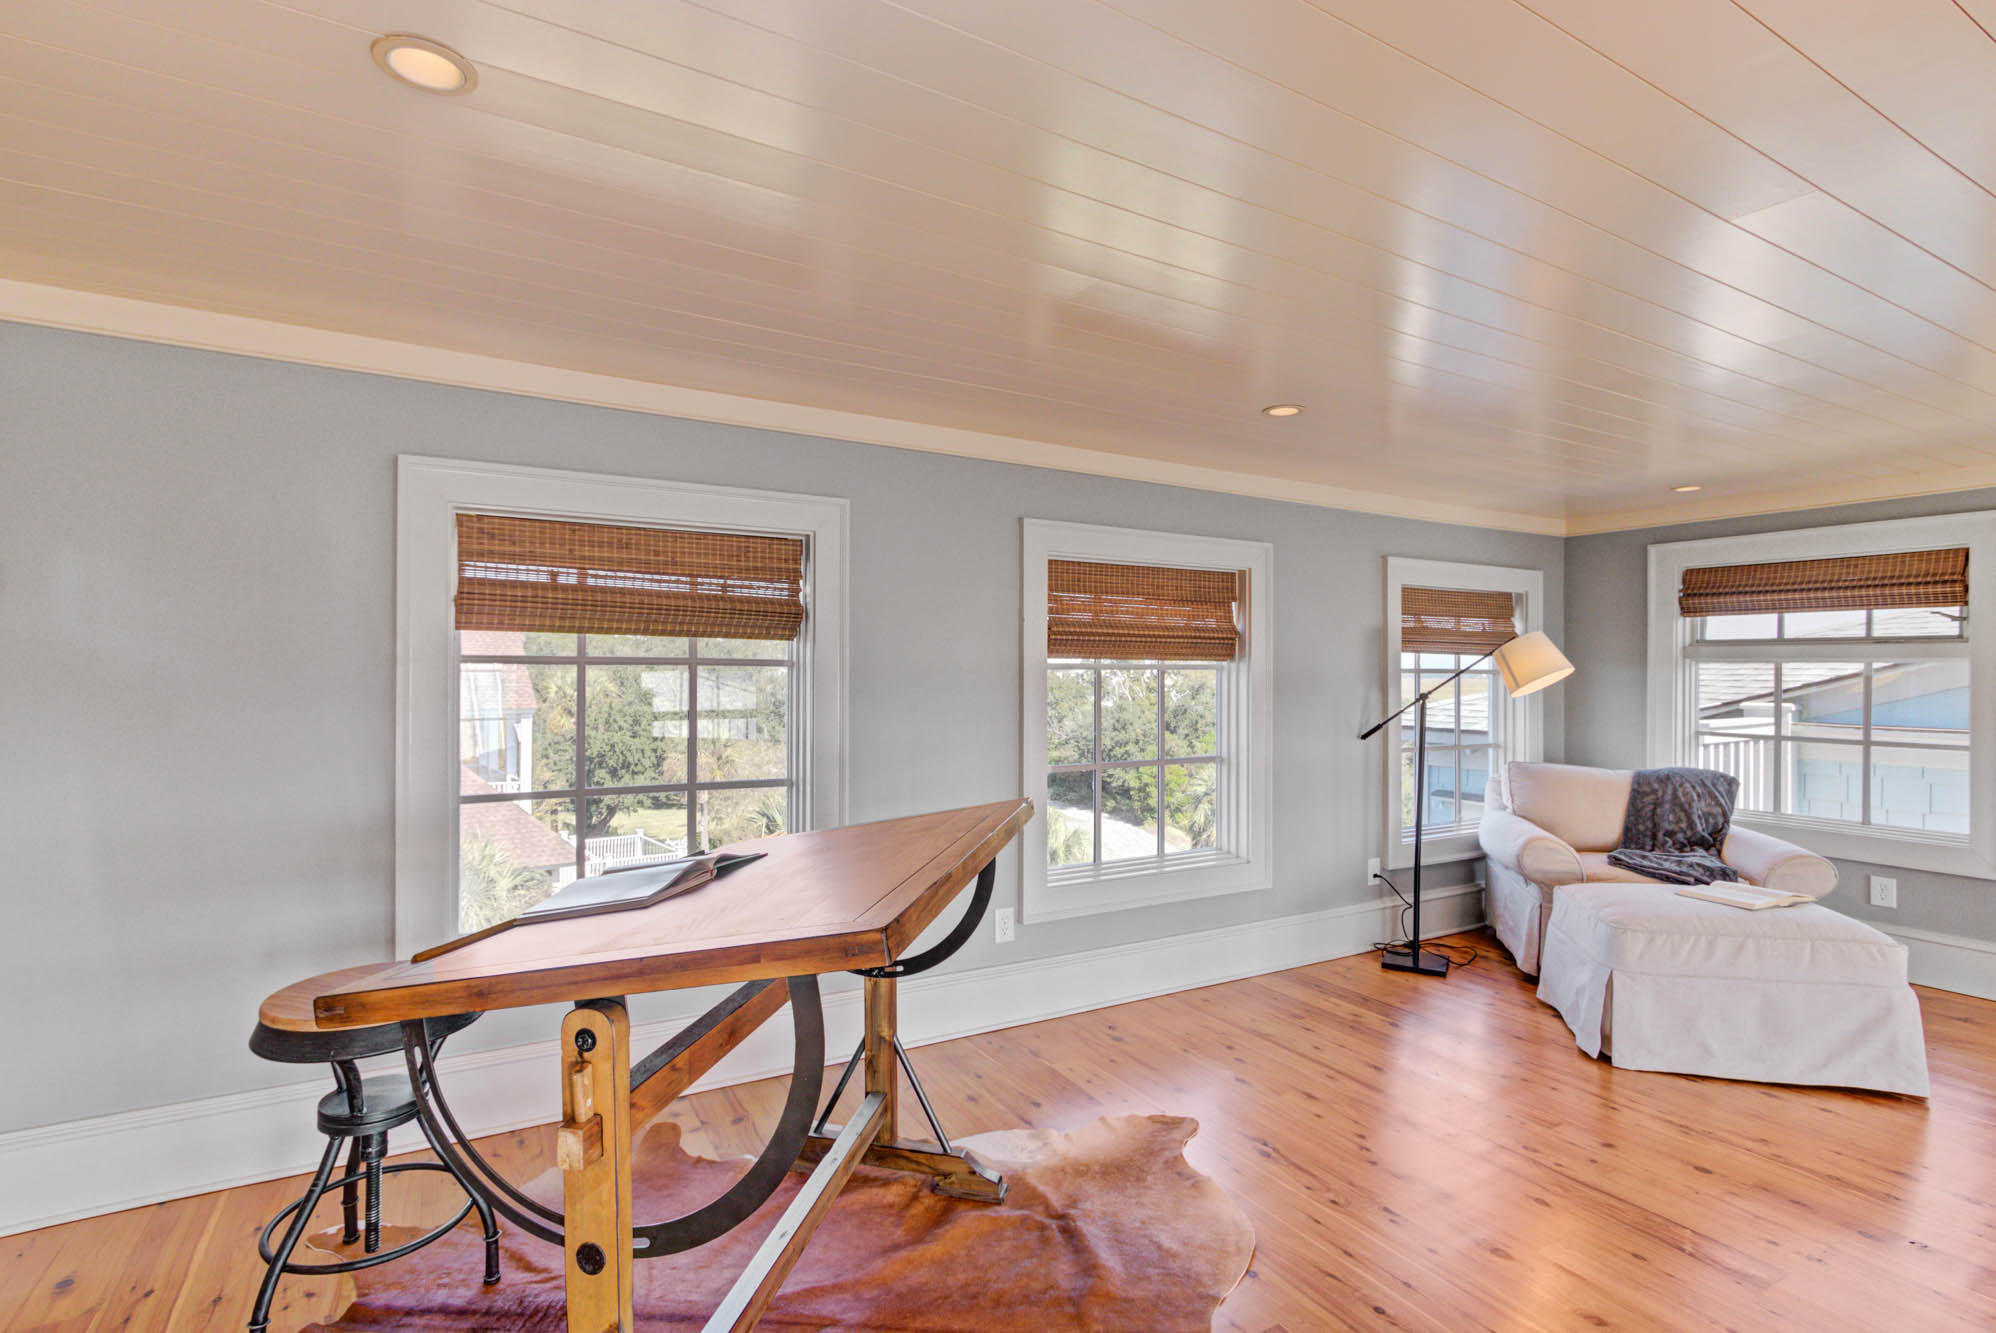 Sullivans Island Homes For Sale - 904 Middle, Sullivans Island, SC - 22